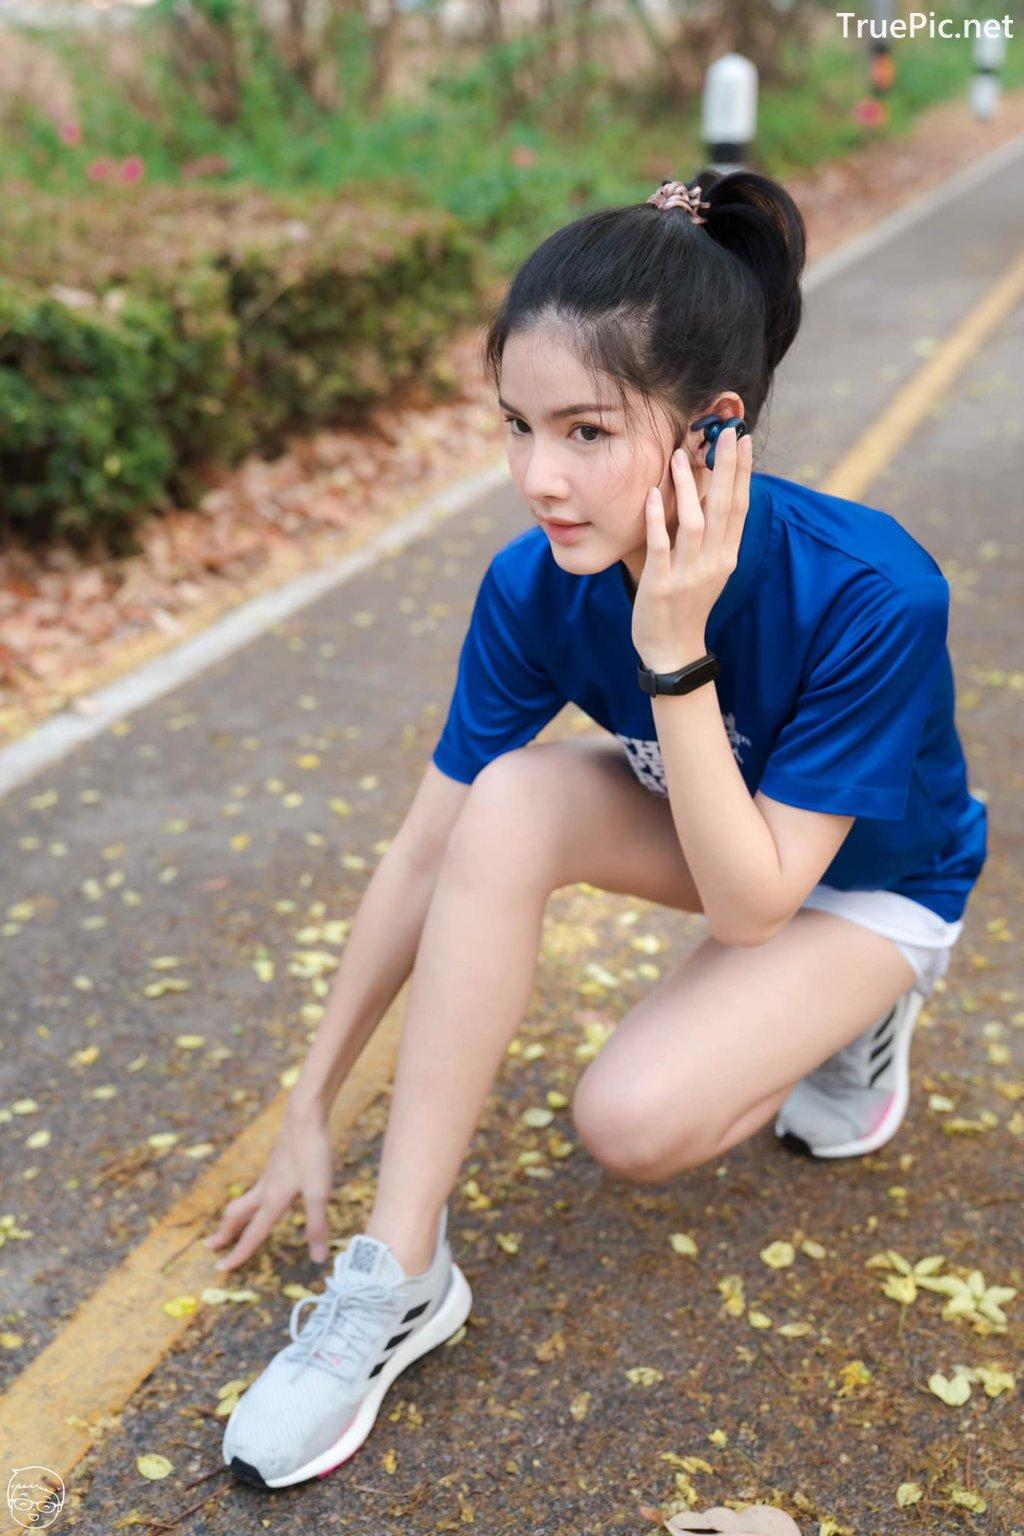 Image Thailand Model - Nuttacha Chayangkanont - Fun & Run - TruePic.net - Picture-1